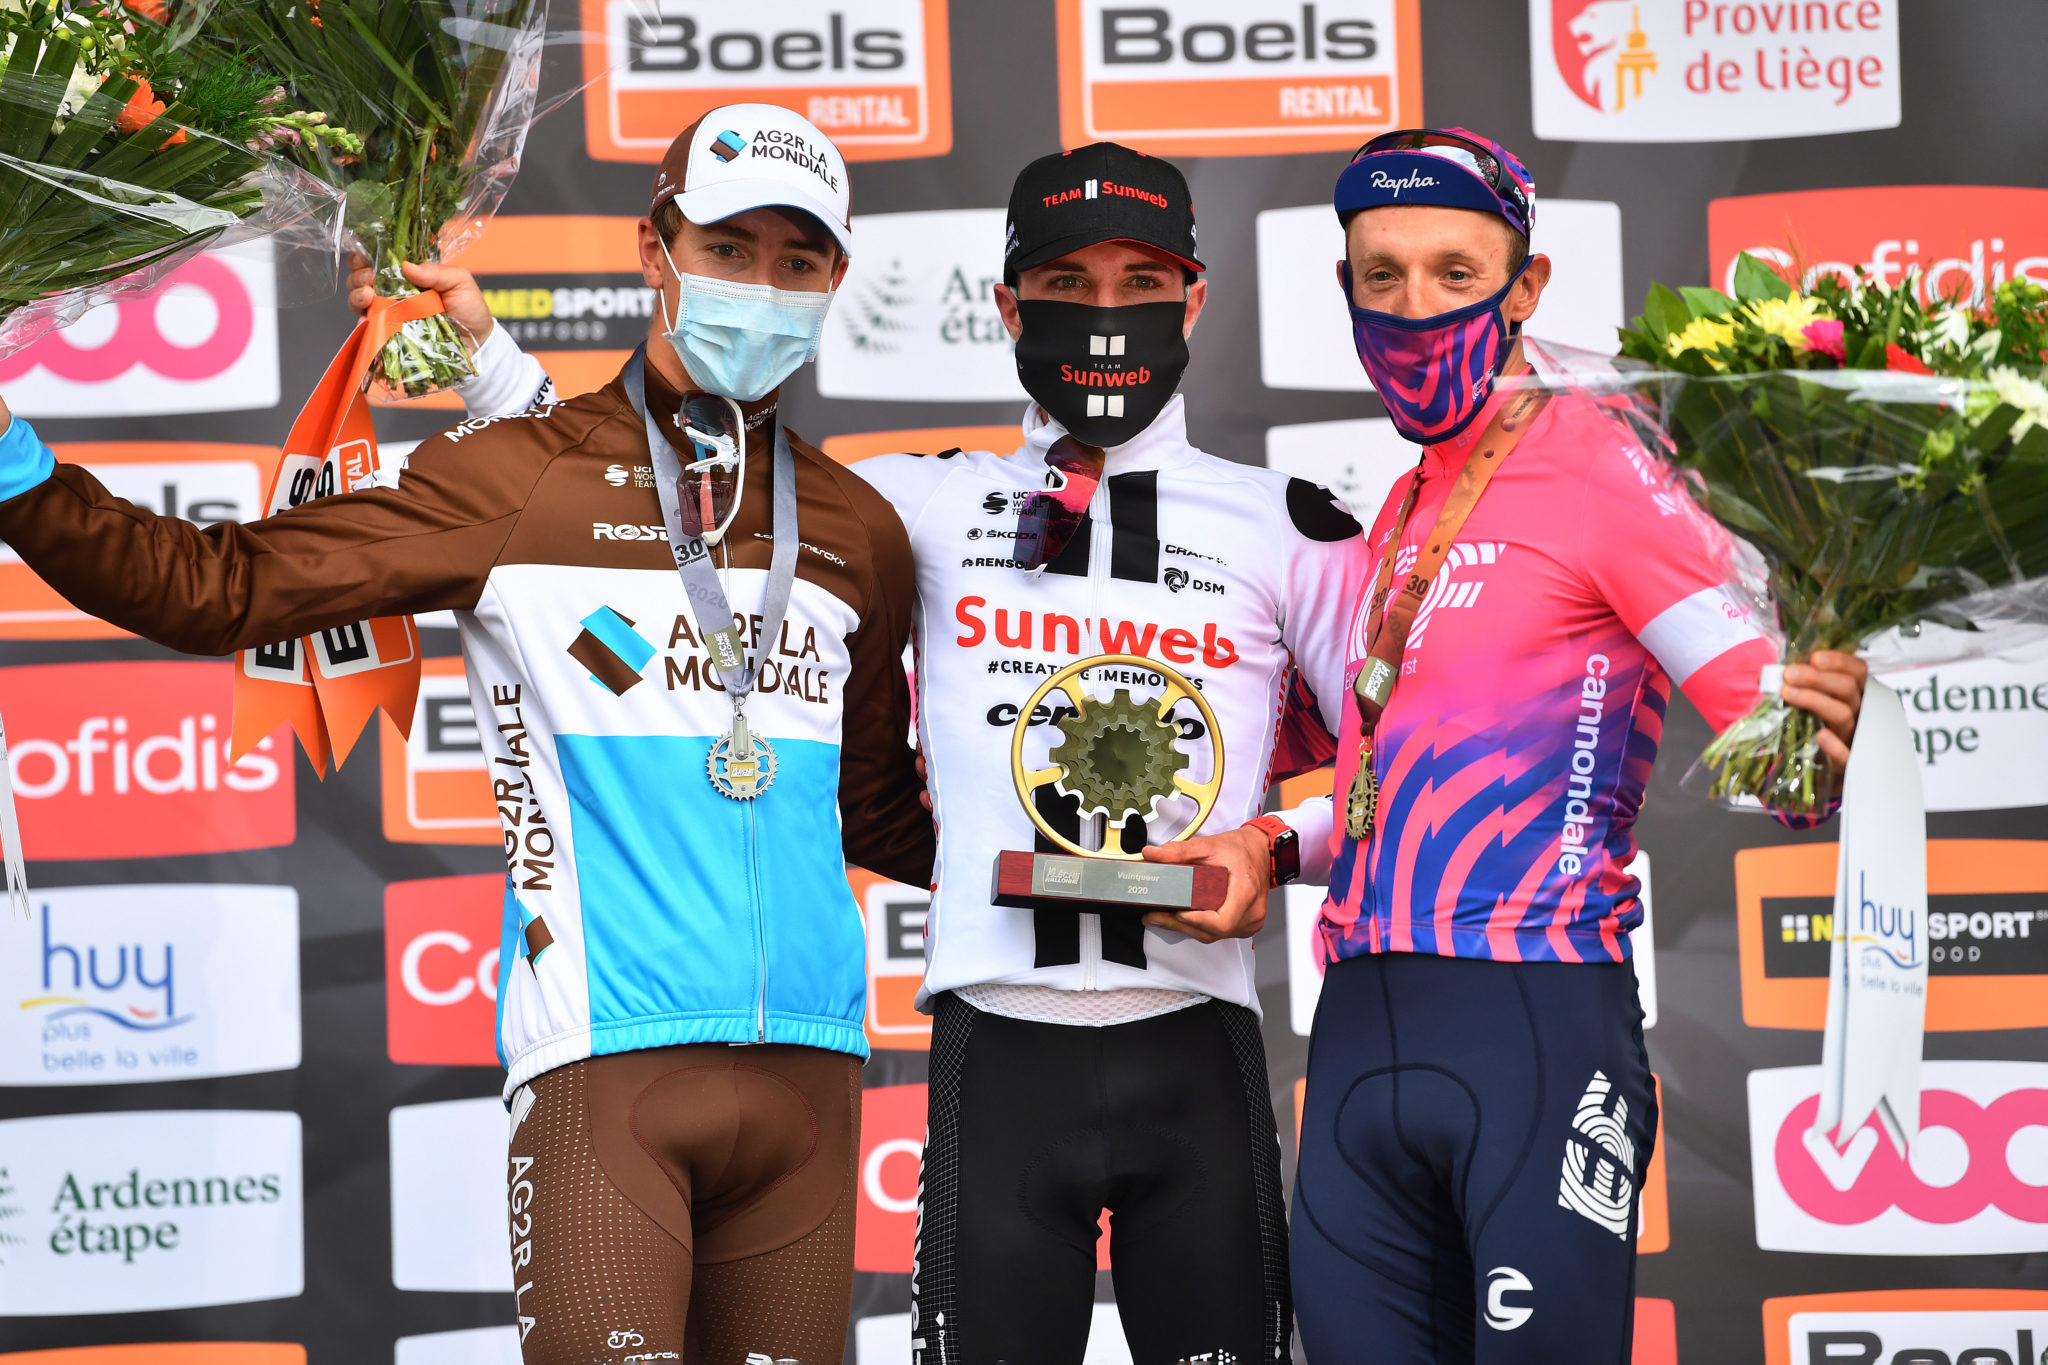 Flèche Wallonne  : Benoît Cosnefroy 2nd